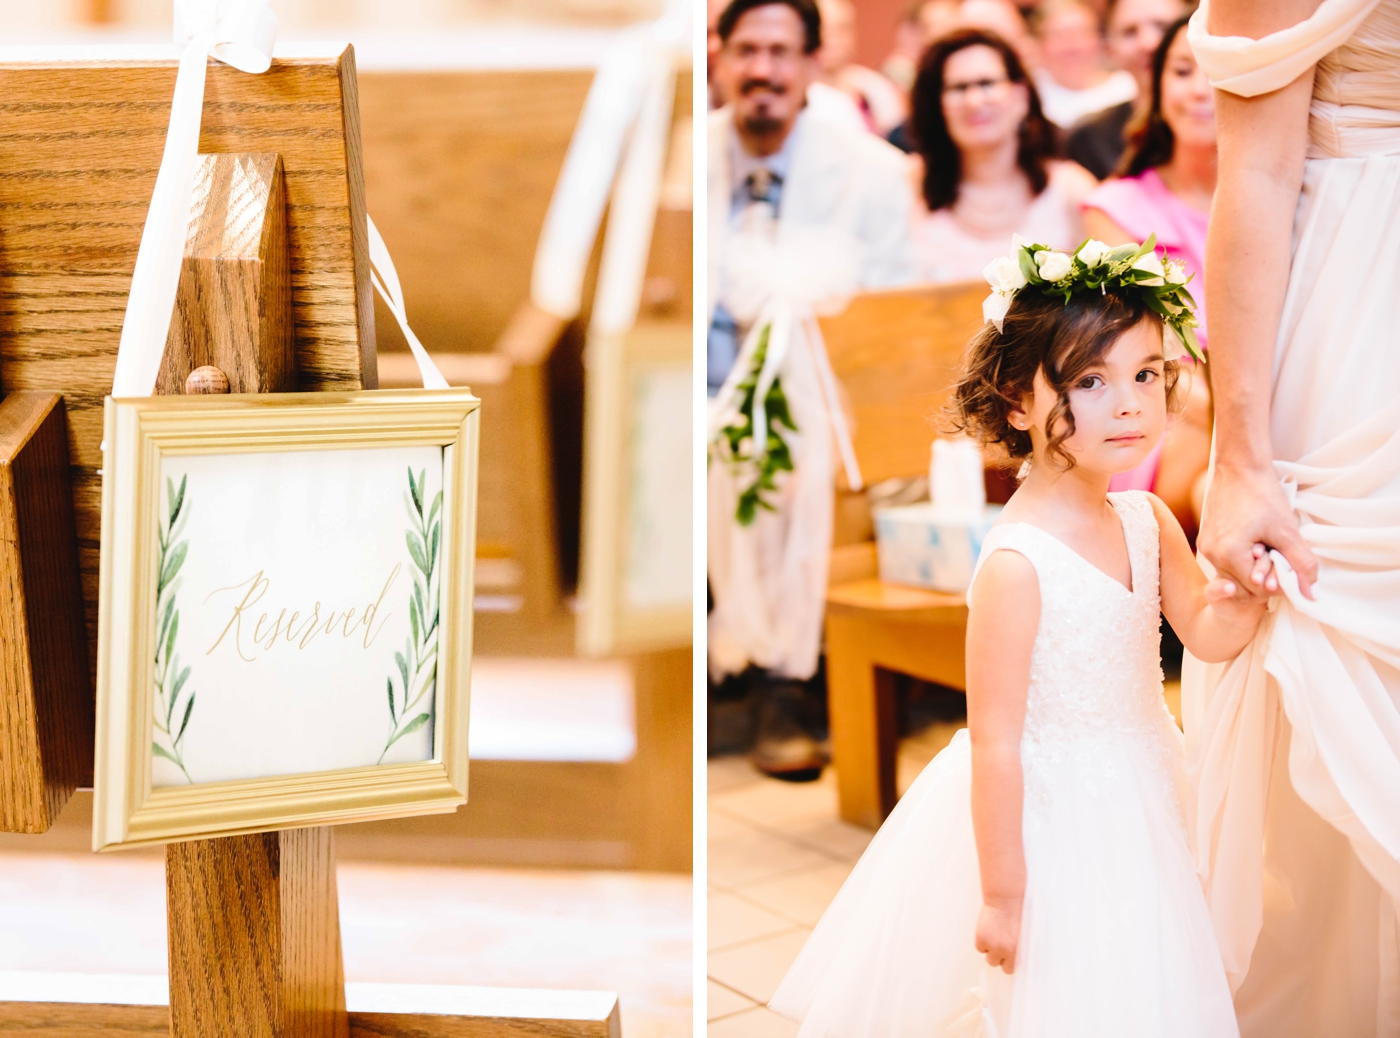 chicago-fine-art-wedding-photography-patano15